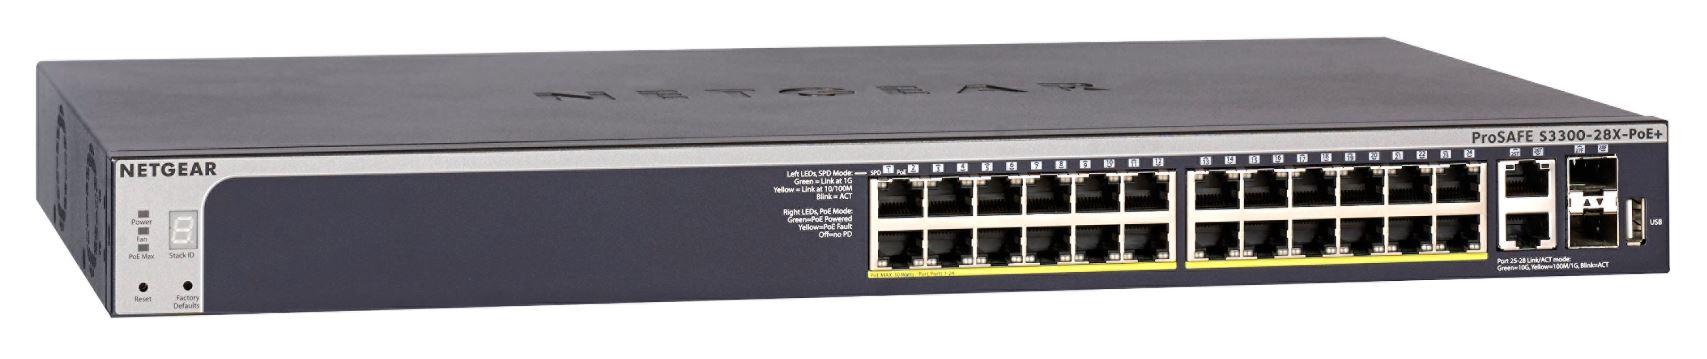 NETGEAR S3300 28PT STKBL POE SMART SW W/ 10G